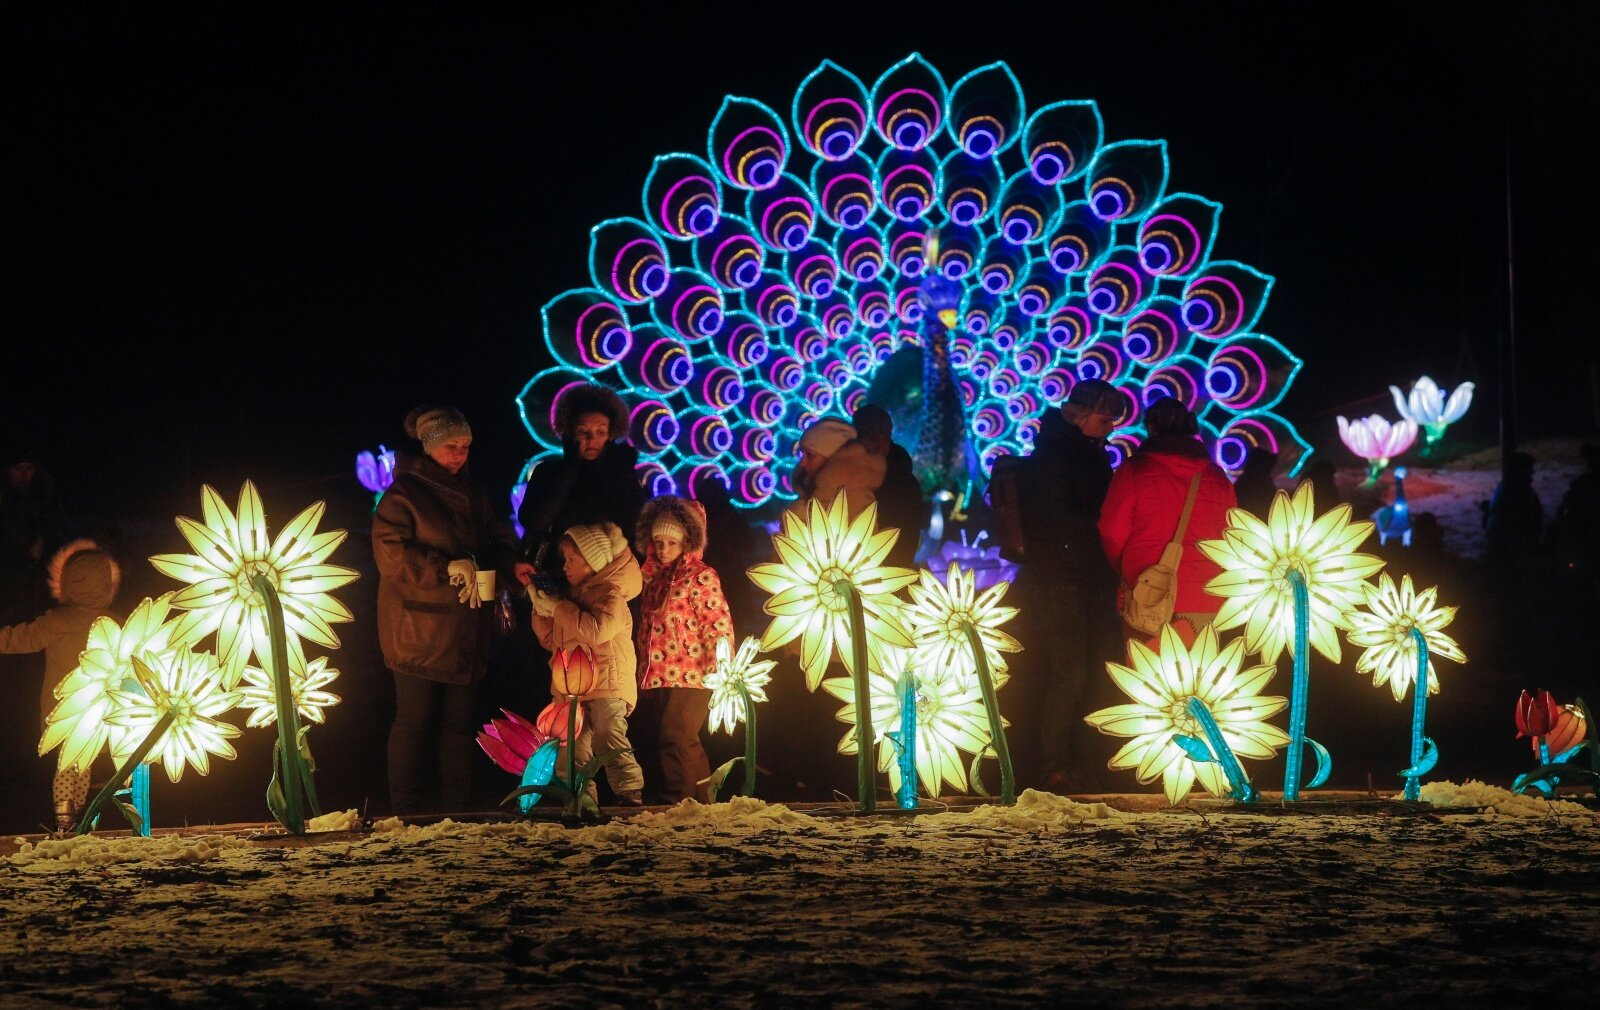 Nowy chiński rok na Ukrainie fot.  EPA/SERGEY DOLZHENKO